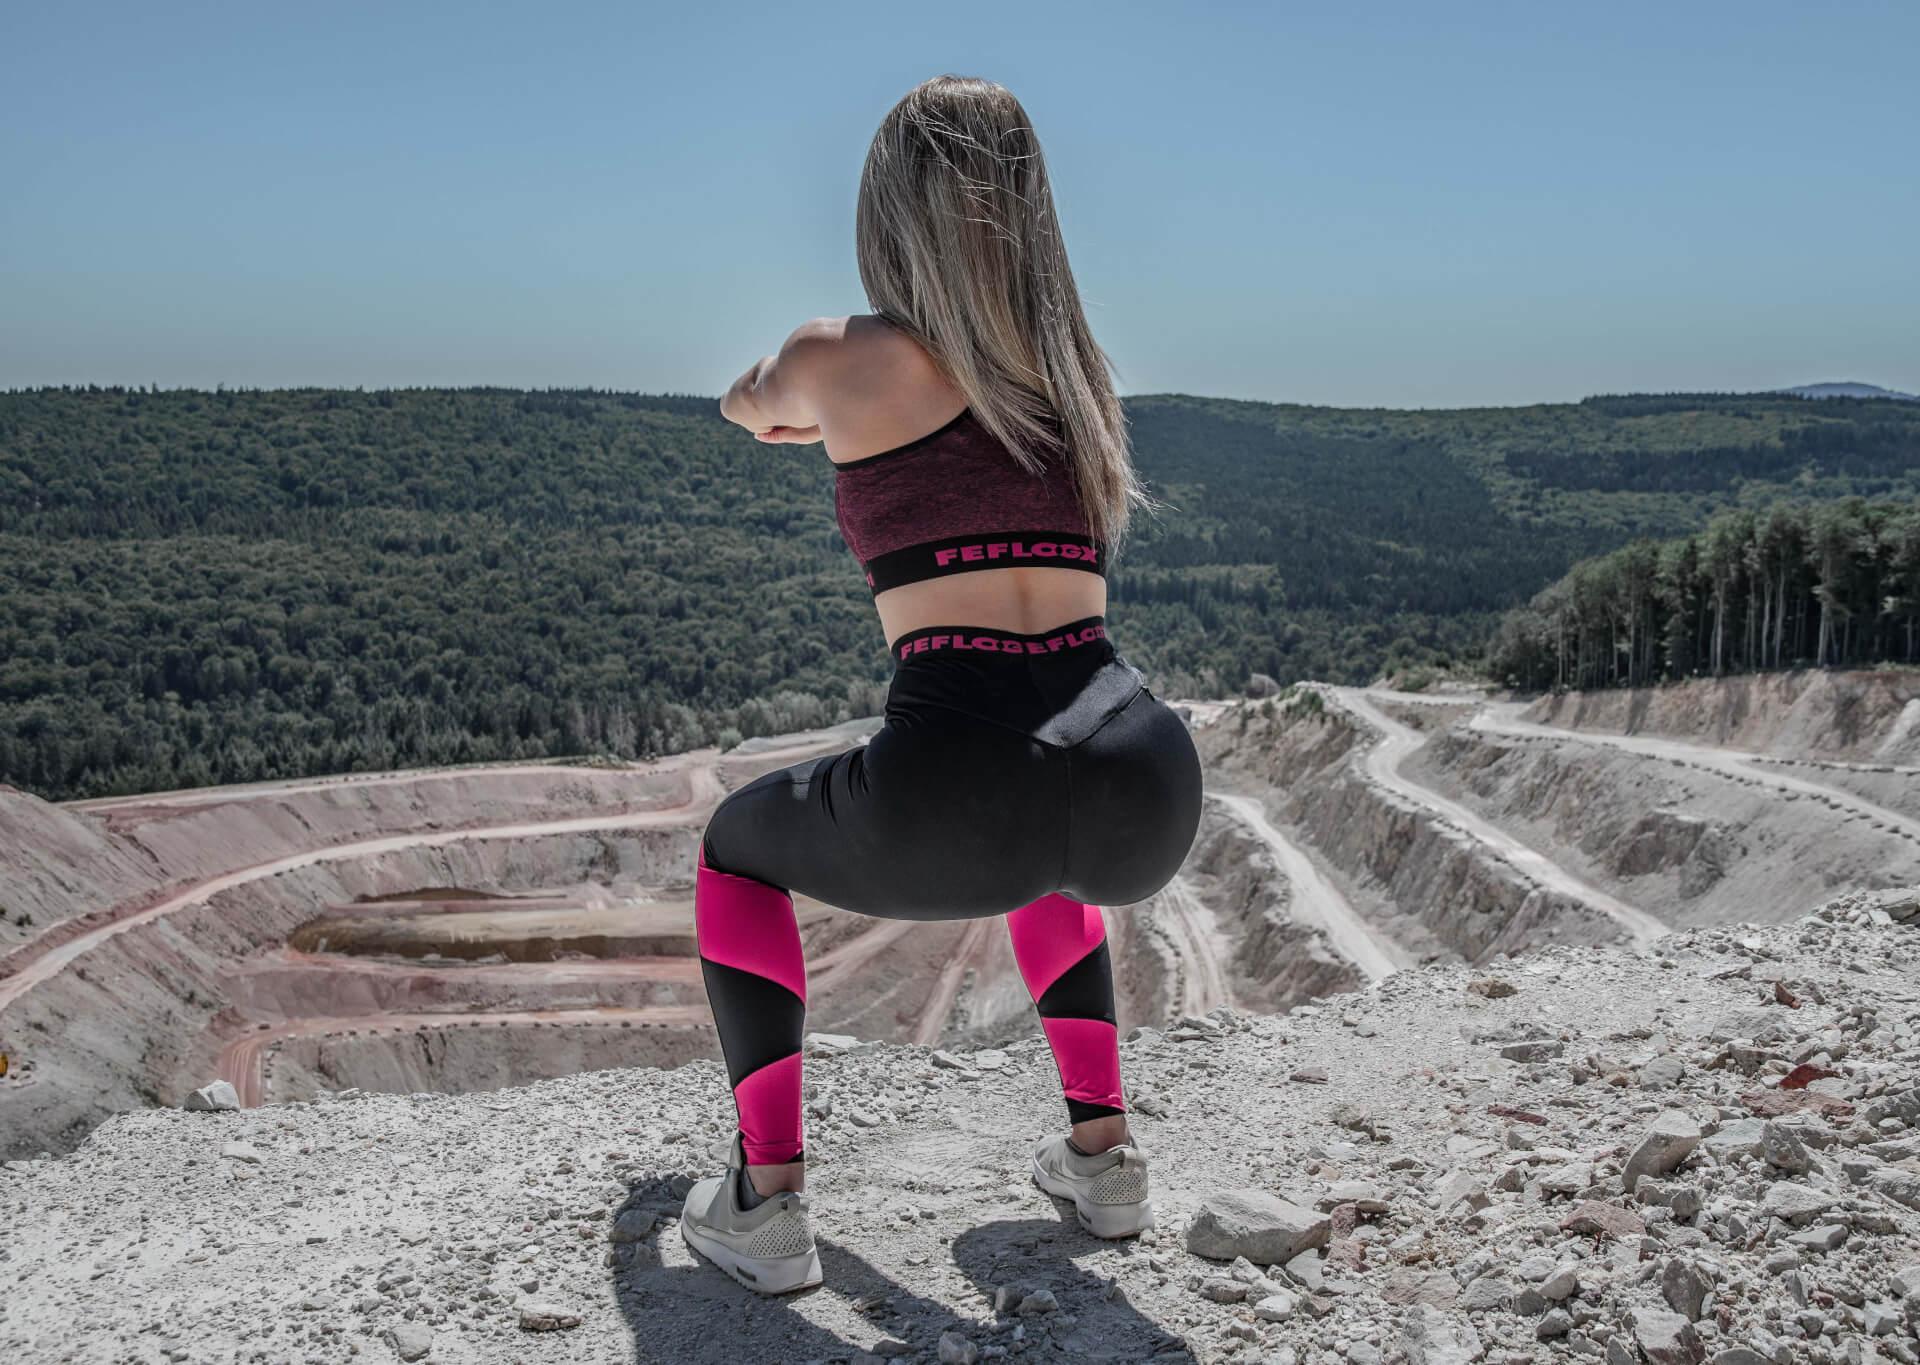 FEFLOGX Sportswear Damen Leggings und Damen Sport-Top Motion, Steinbruch-Shooting (3).